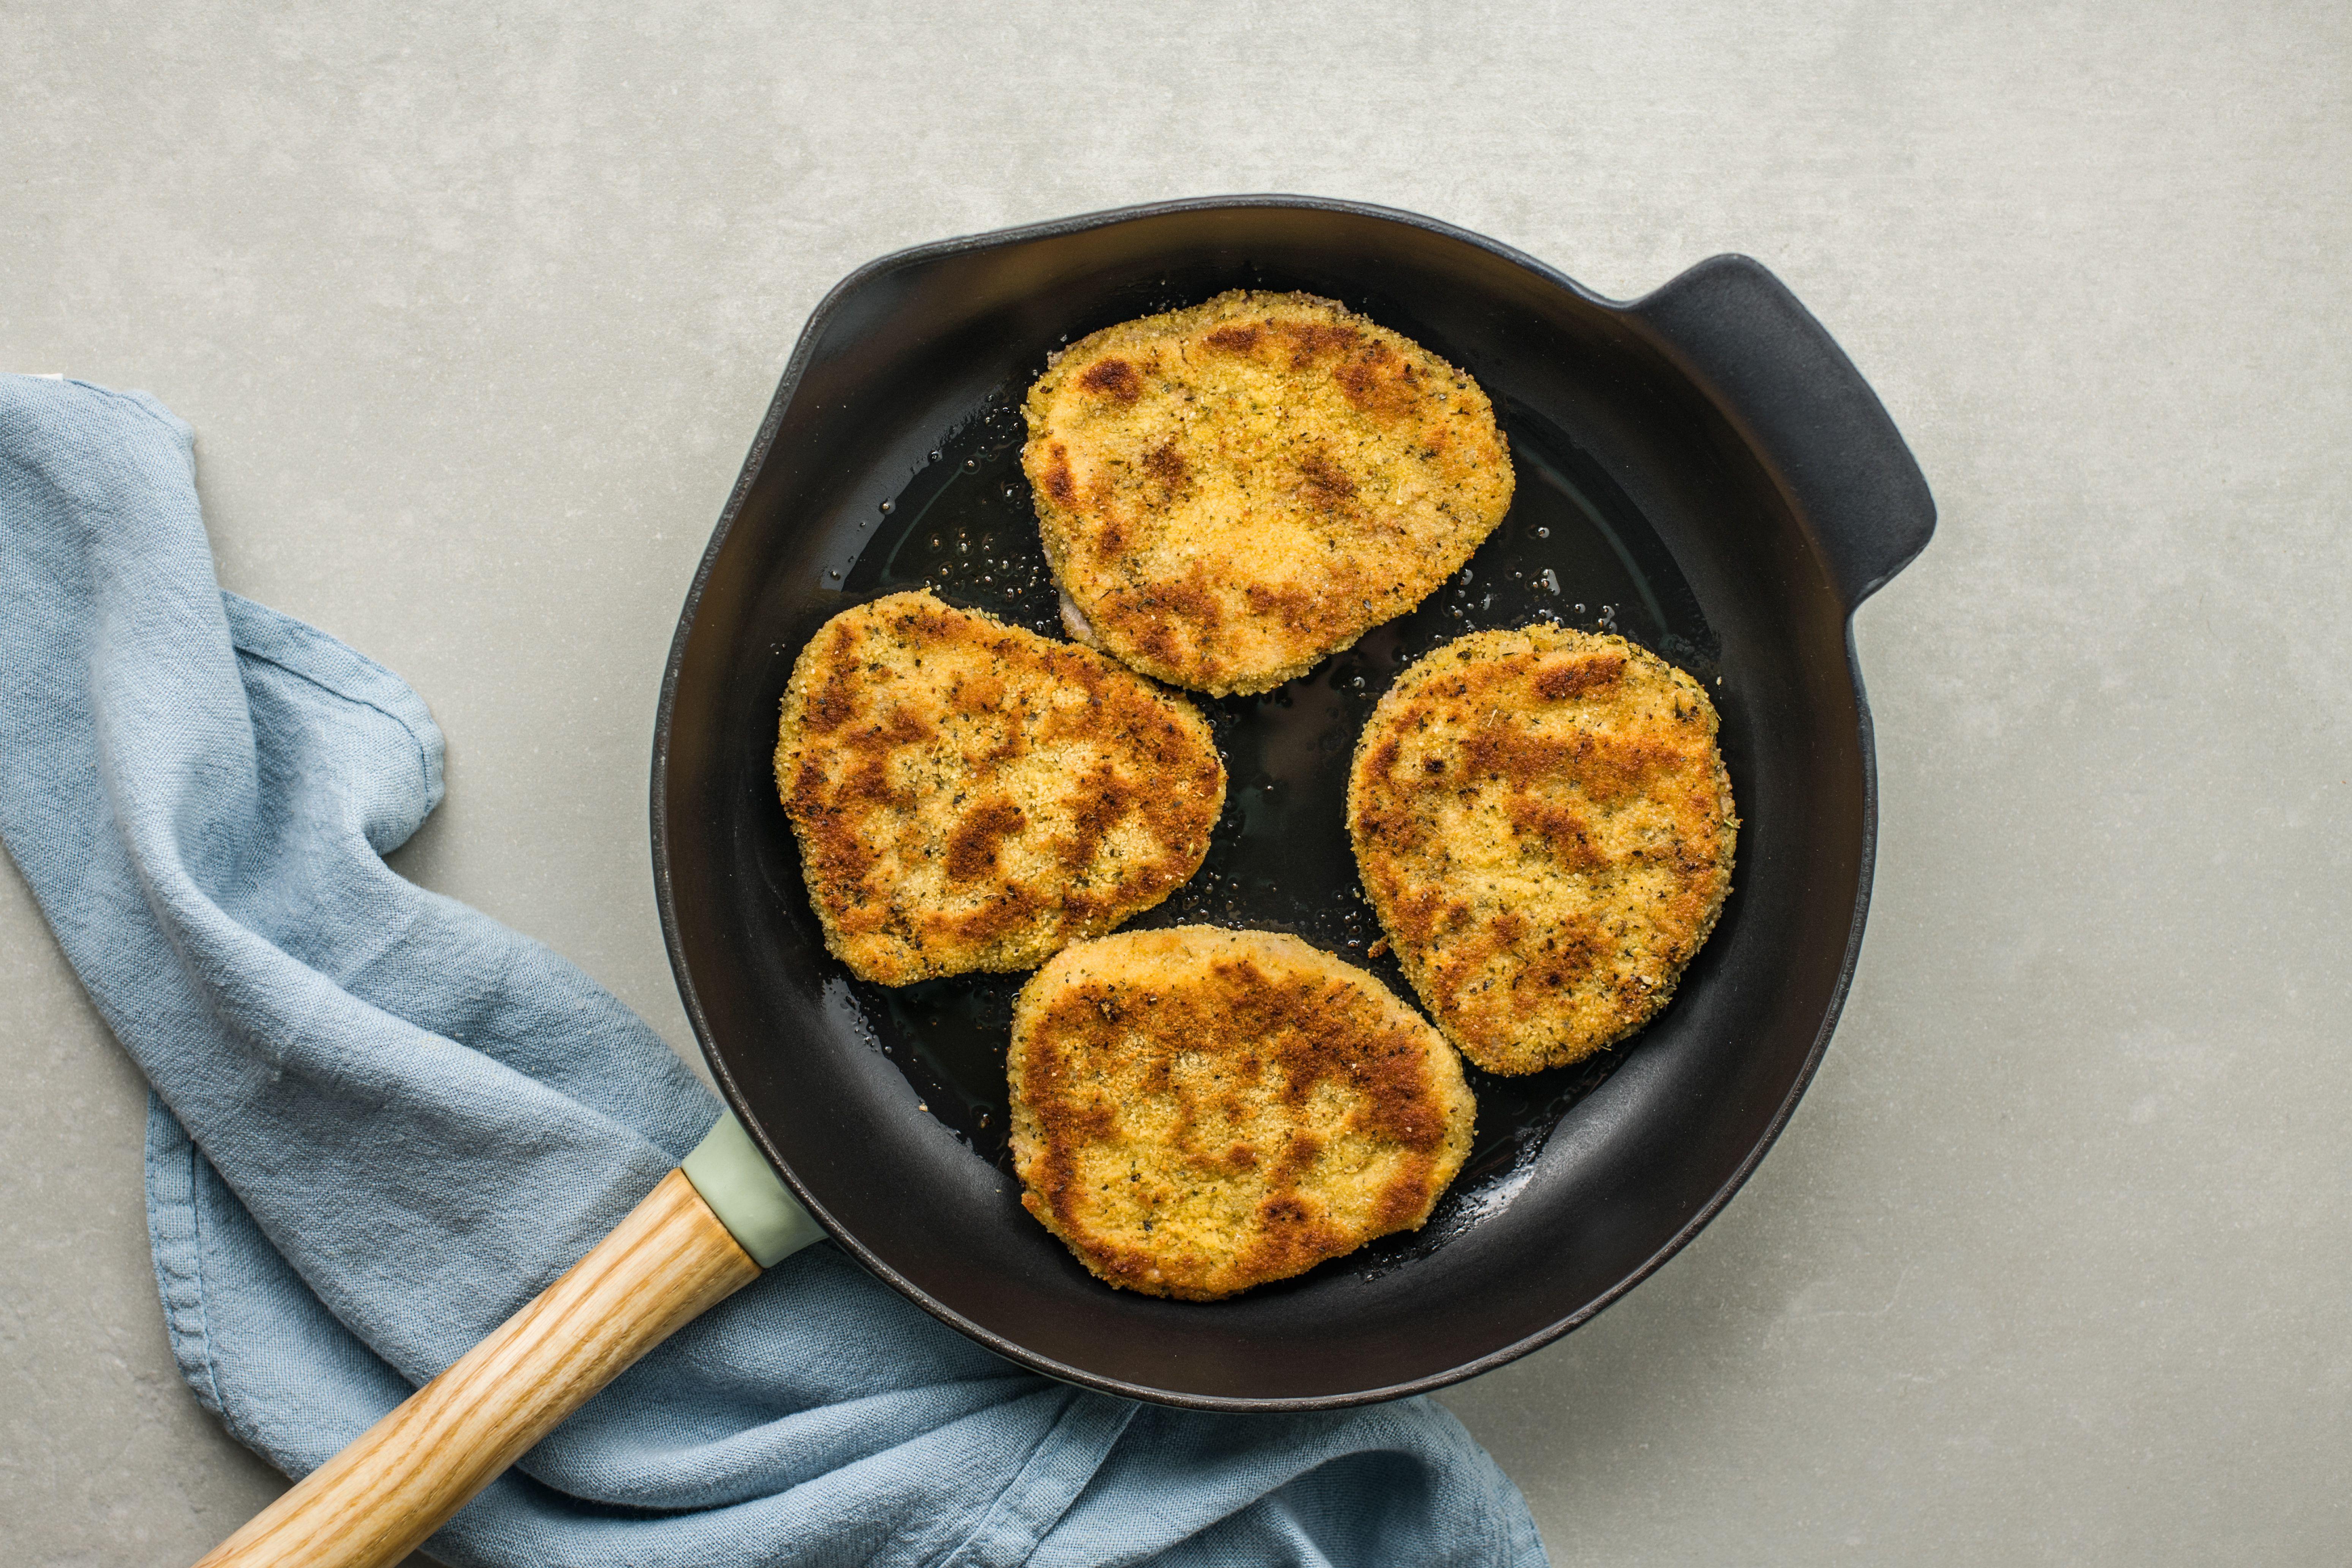 fry cutlets